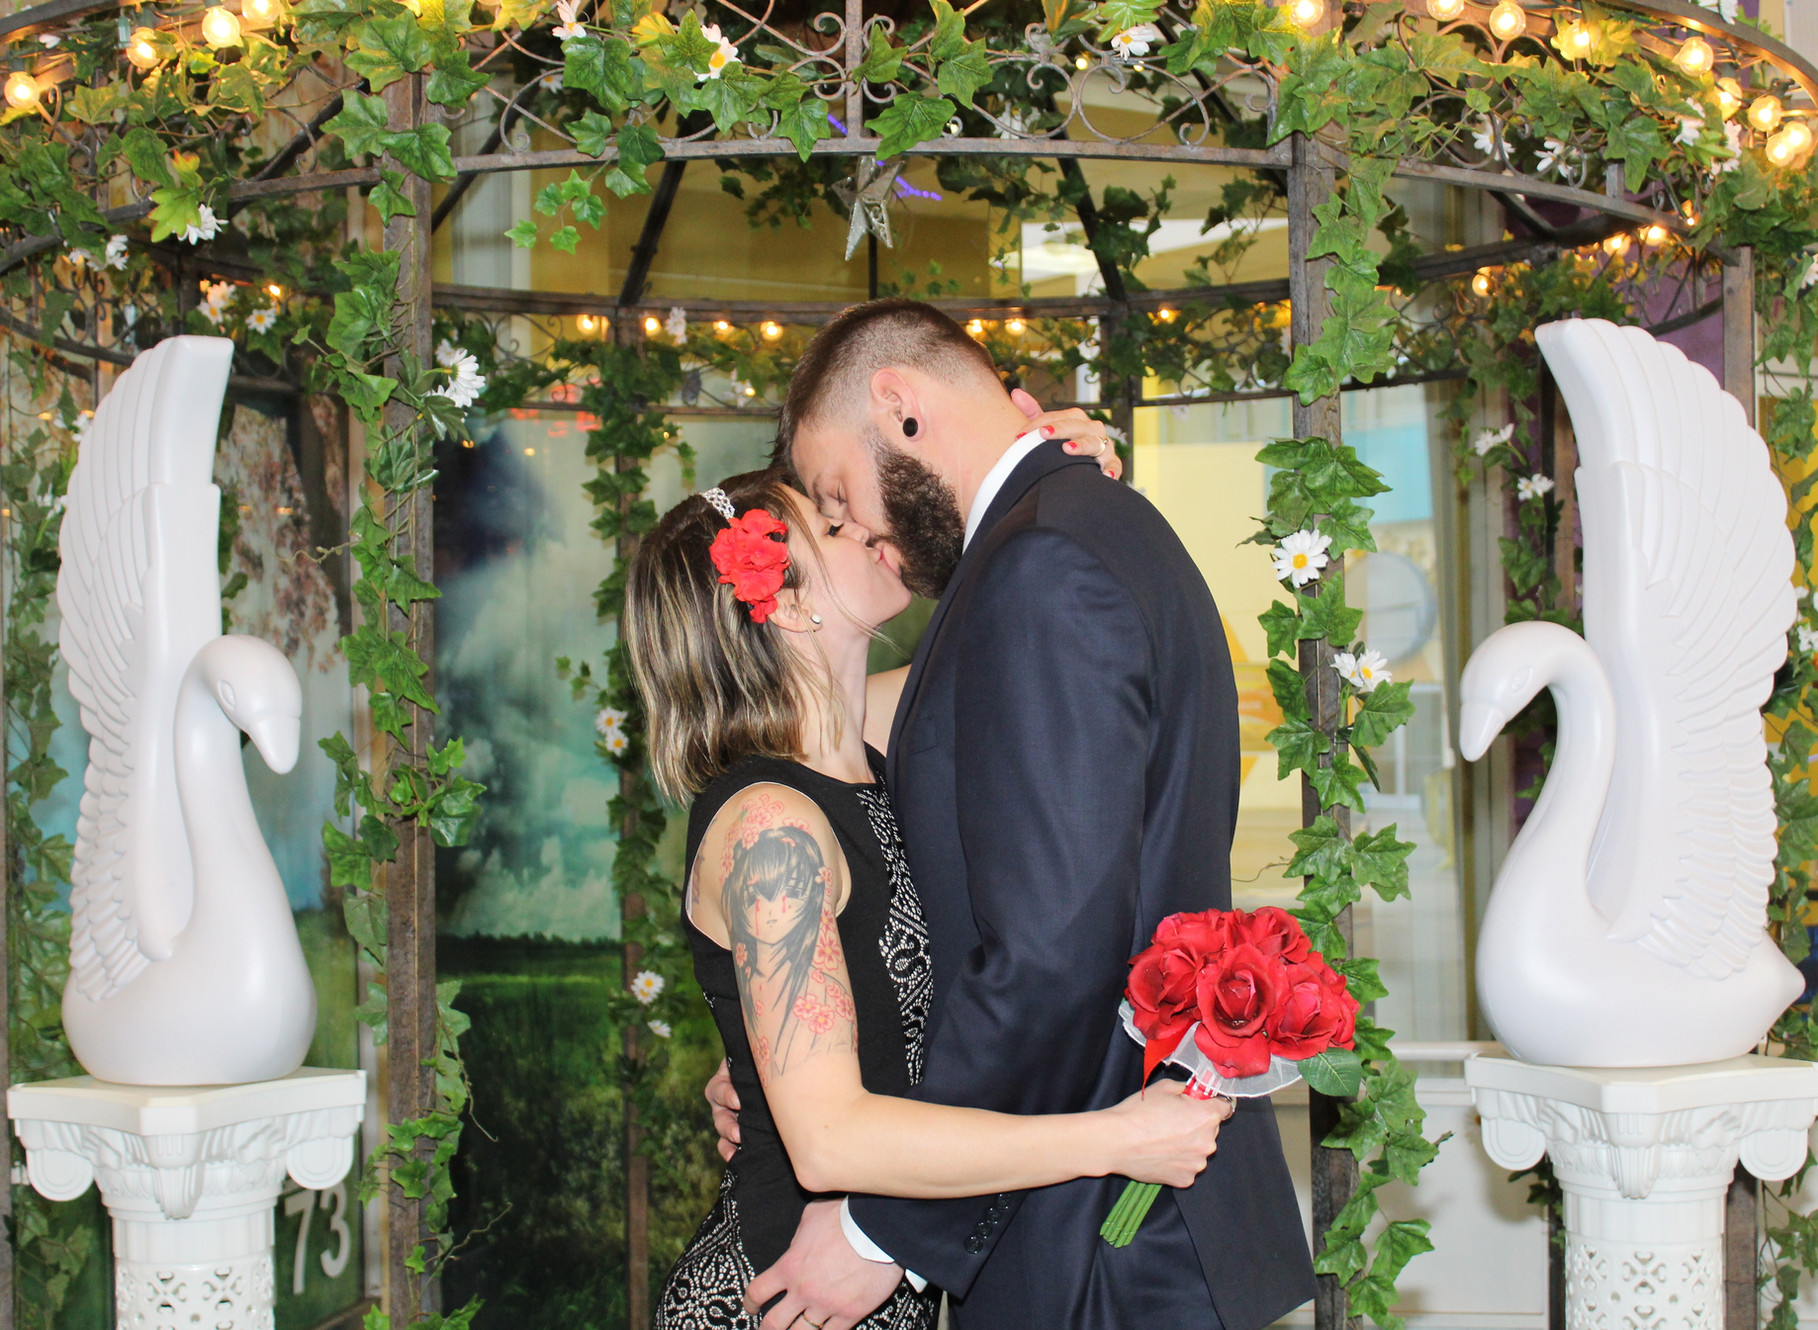 Vegas Wedding Packages.39 Vegas Wedding Packages Getting Married In Vegas Nevada